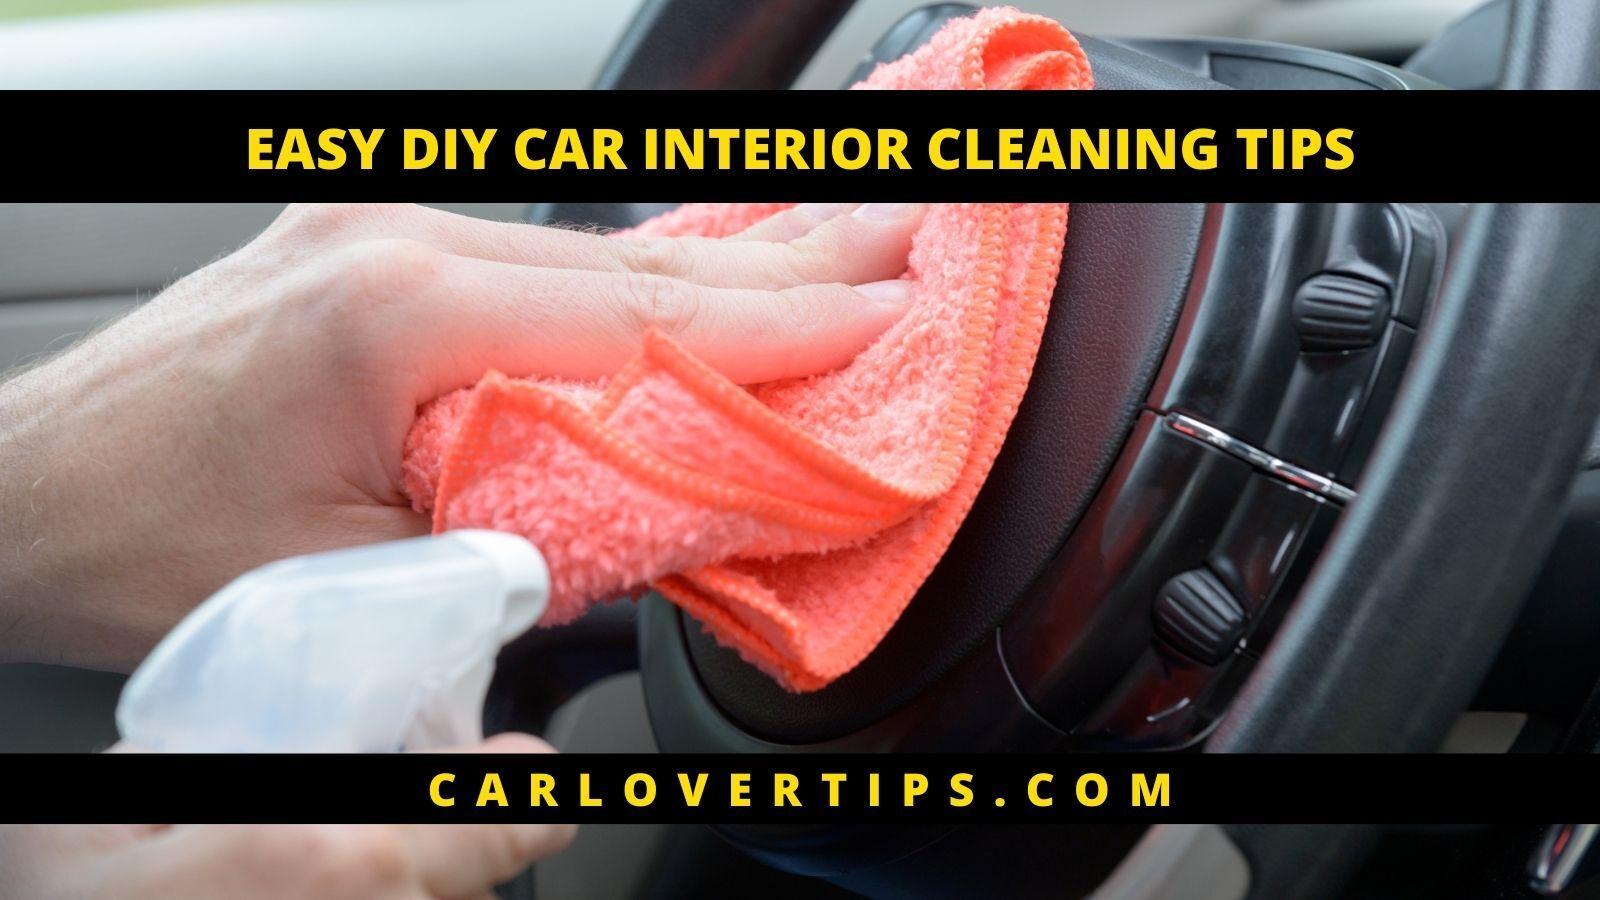 EASY DIY CAR INTERIOR CLEANING TIPS Car Lover Tips